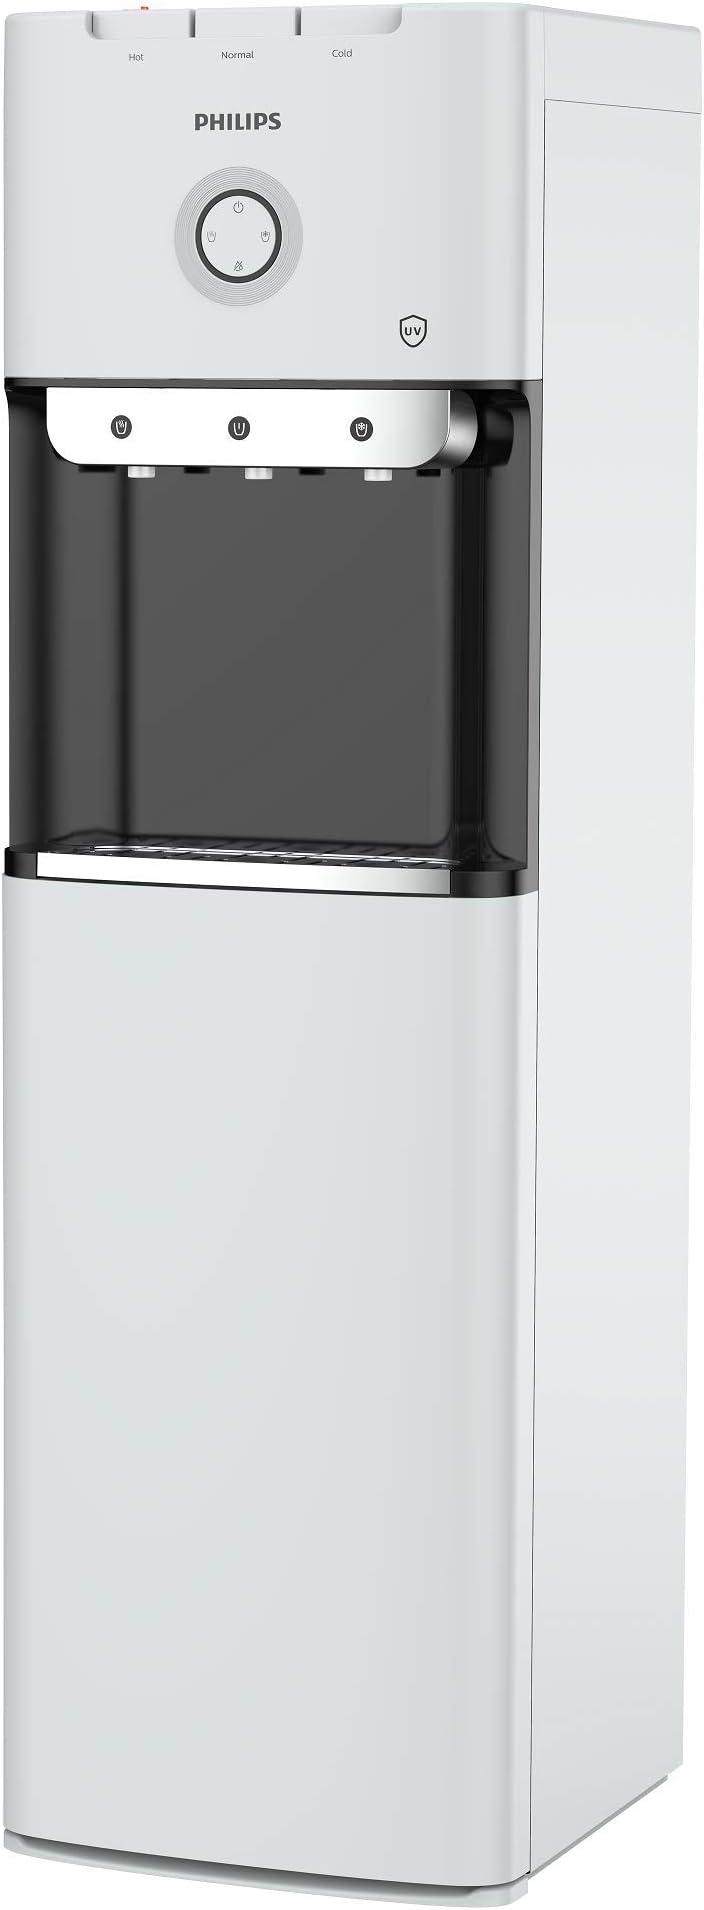 فيليبس مبرد مياه، ساخن، بارد، عادي، 500 واط، أبيض/أسود